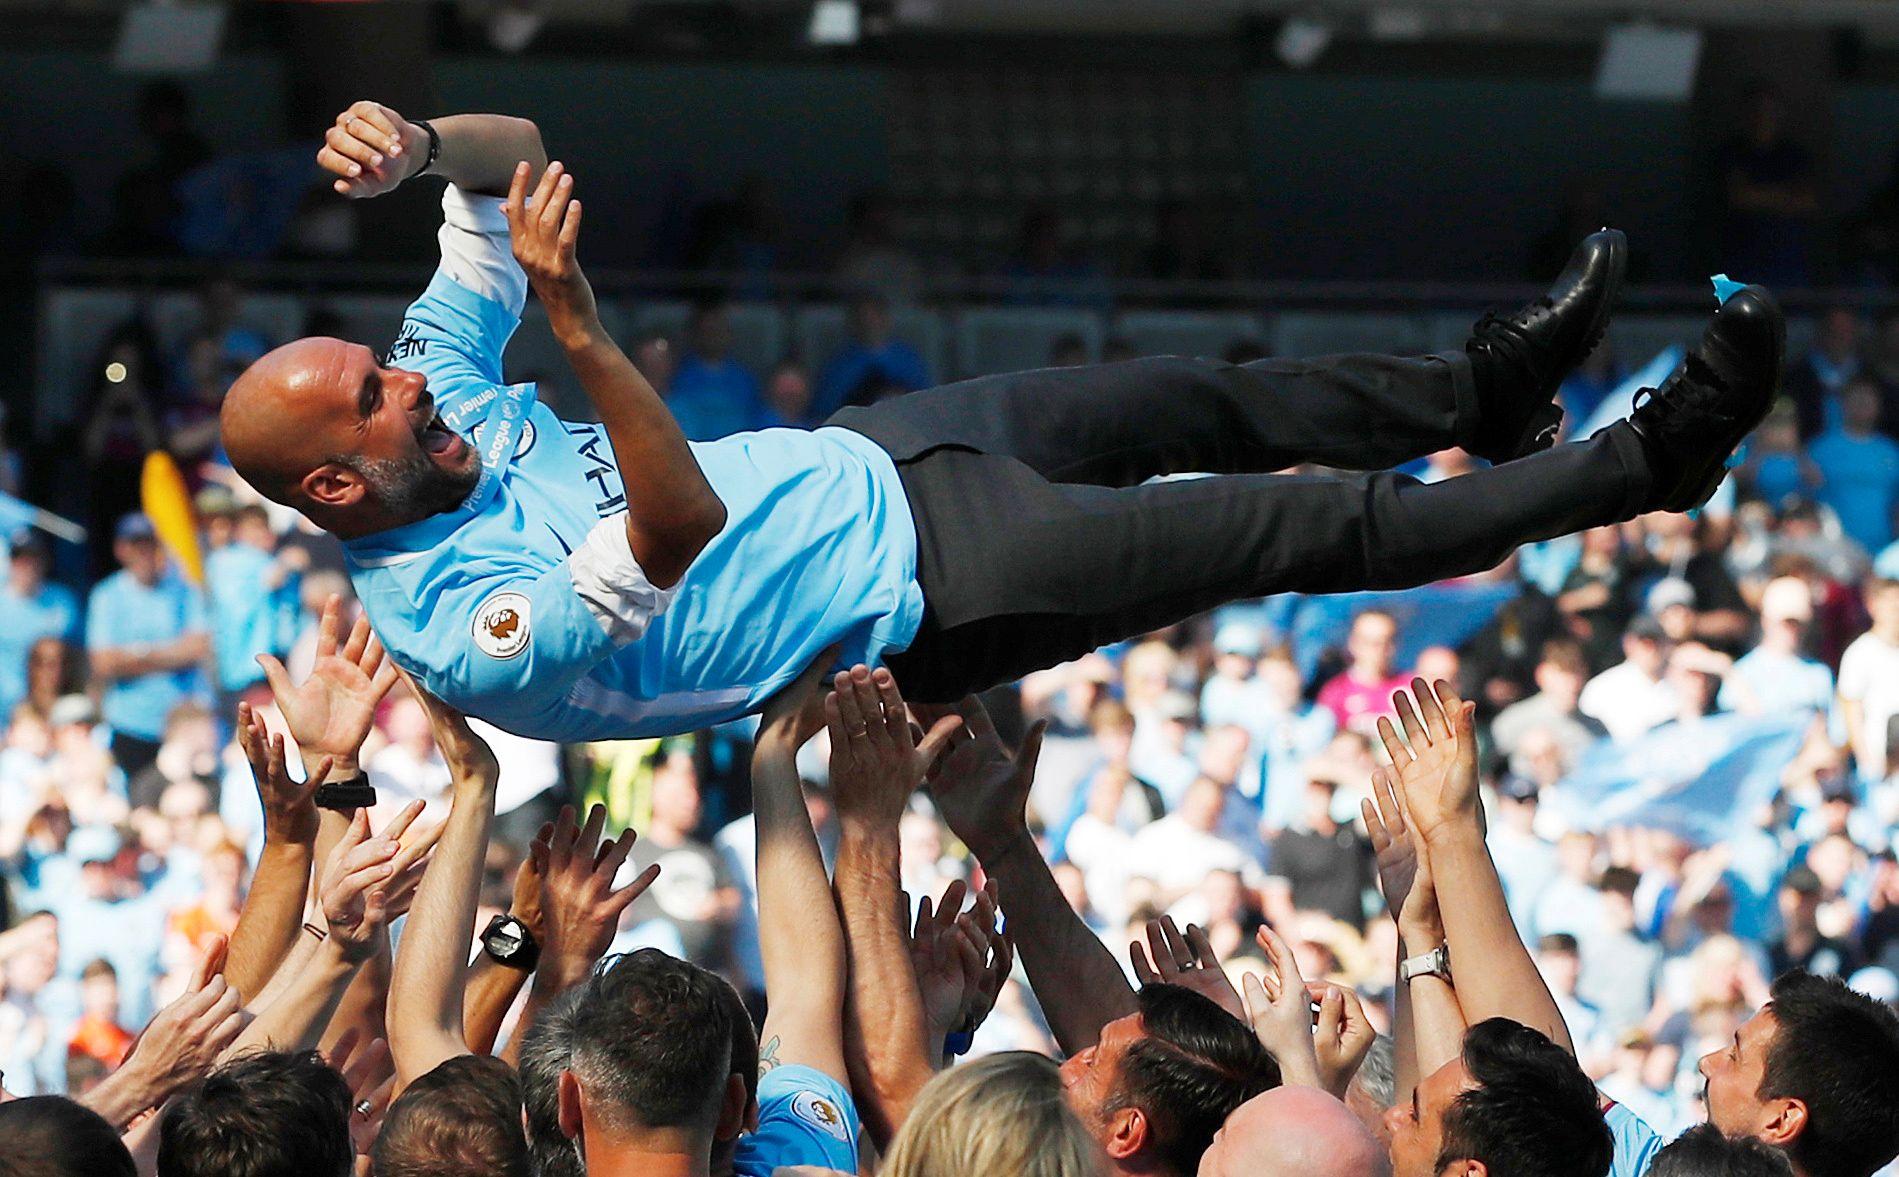 SUVEREN I SERIEN: Pep Guardiolas Manchester City har feid gjennom Premier League i suveren stil. Er der dermed en selvfølge at spanjolen er årets manager?